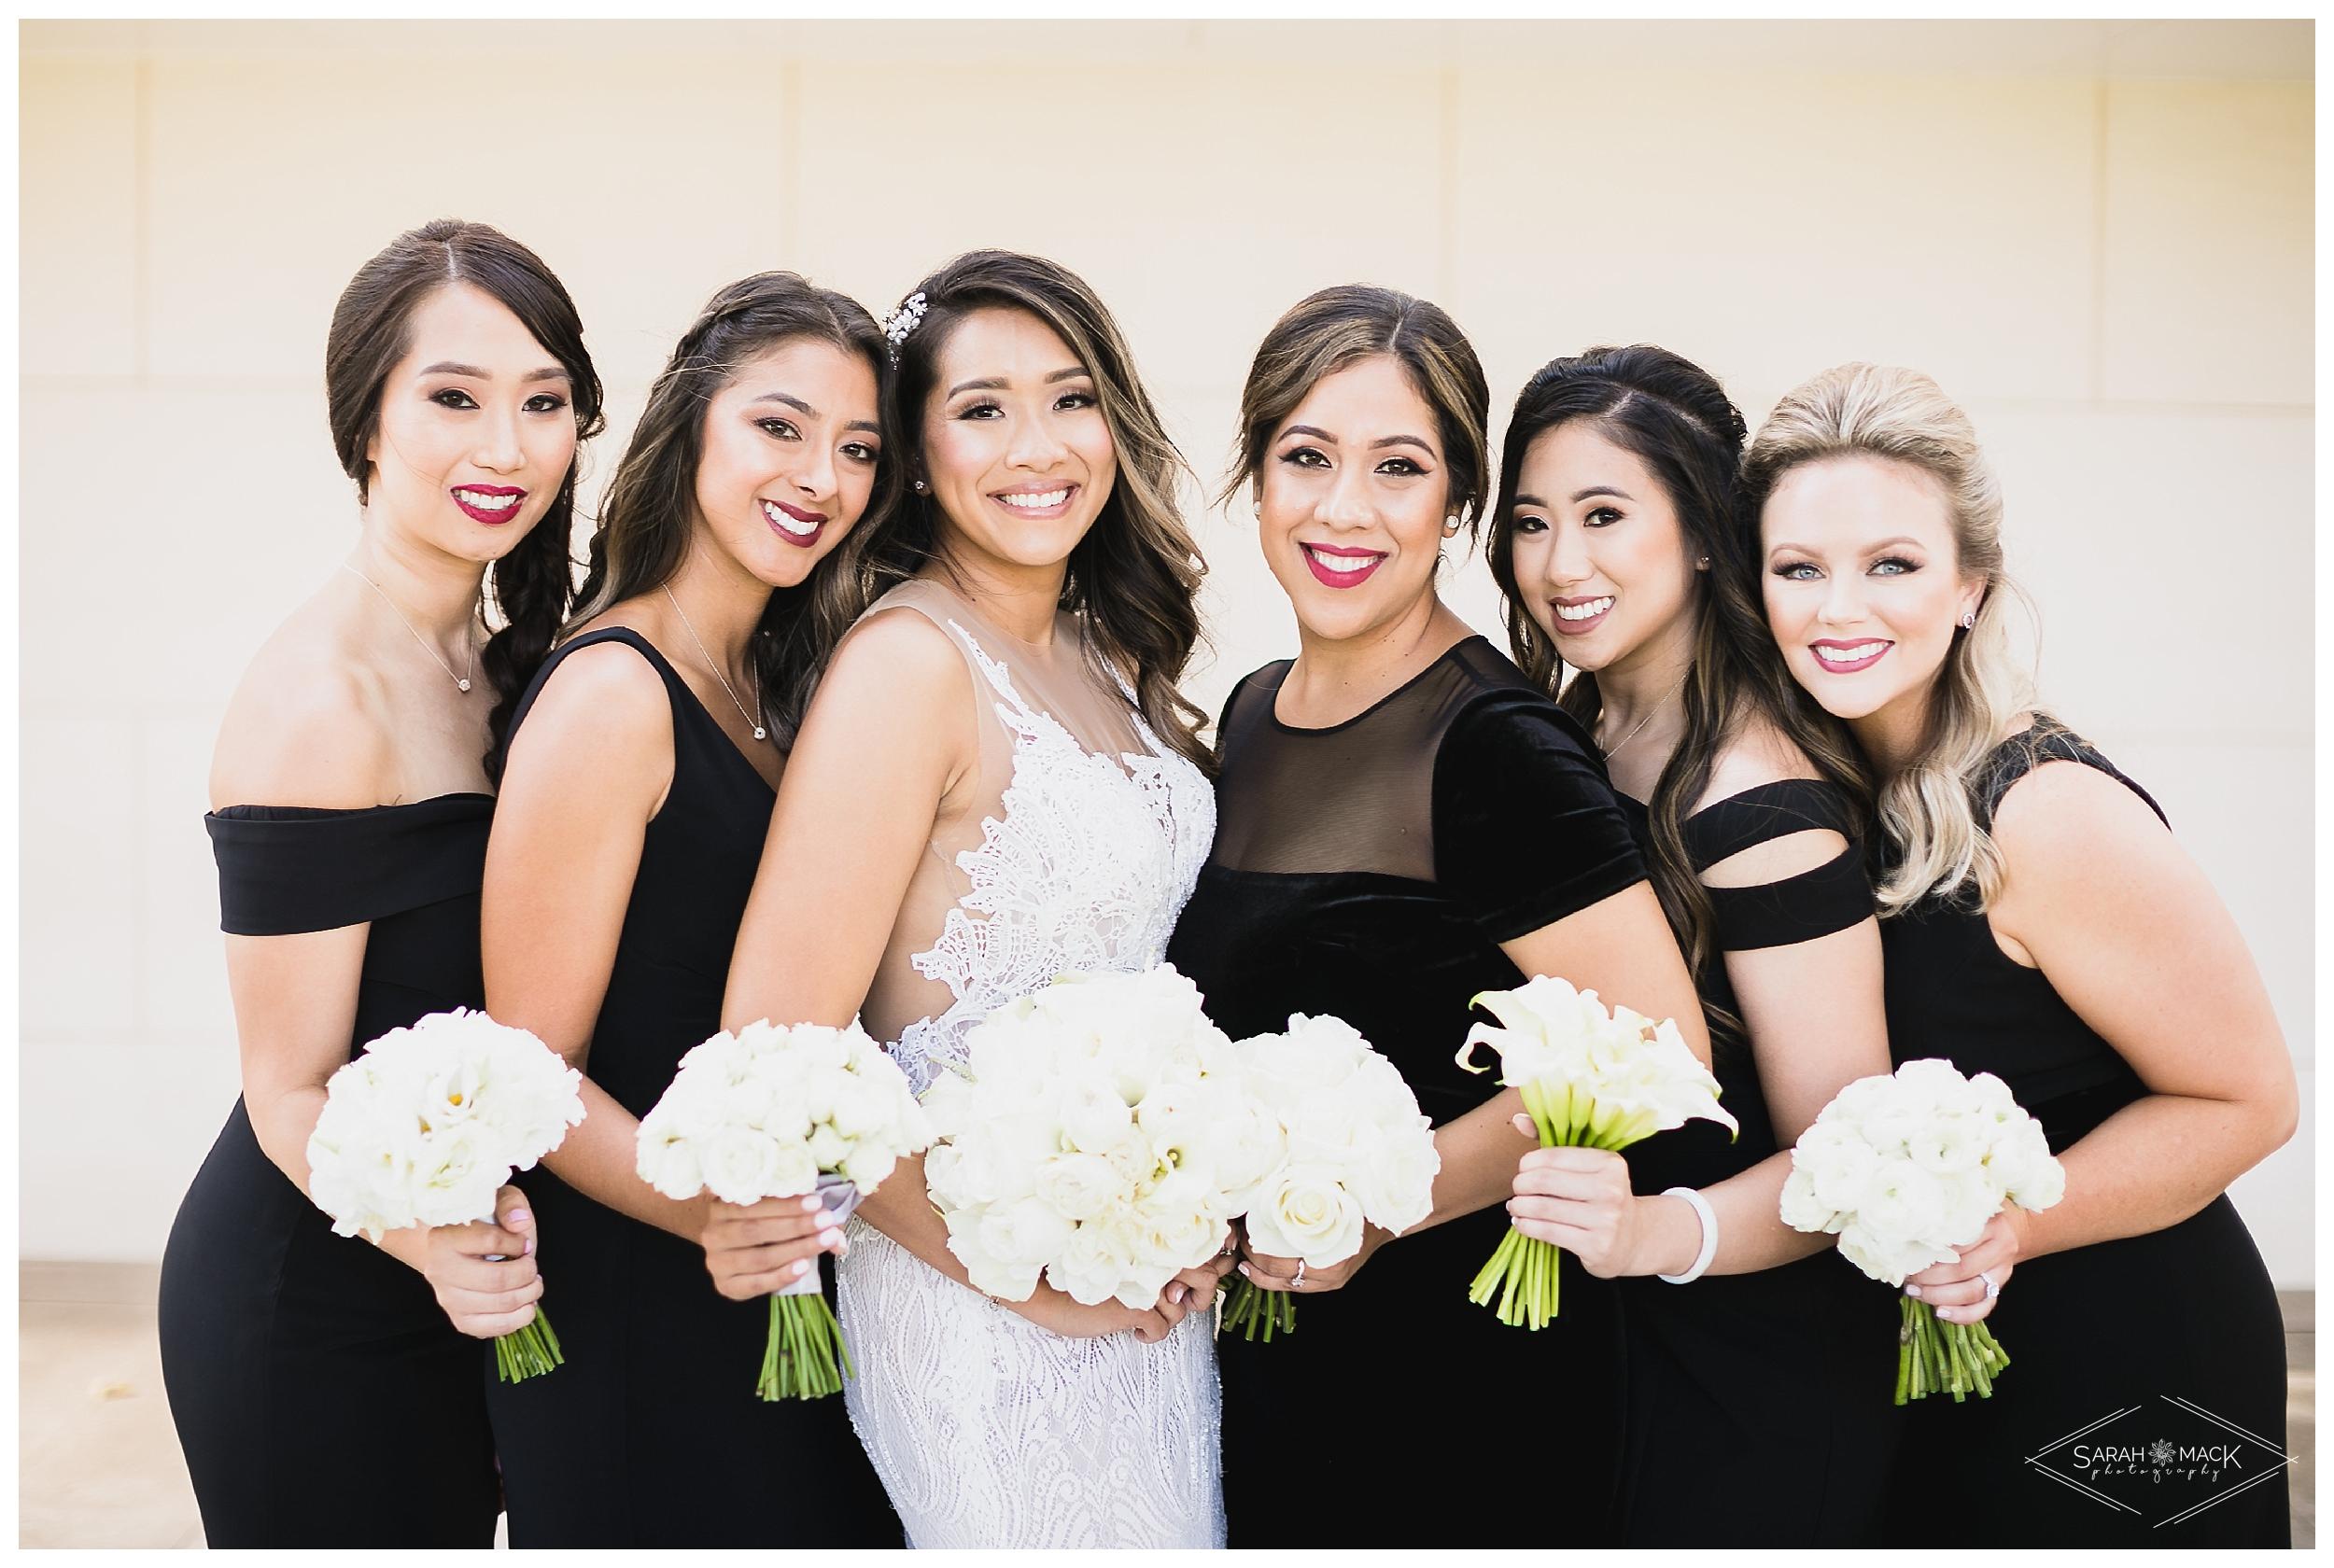 LE-Avenue-of-the-Arts-Costa-Mesa-Wedding-Photography-0099.jpg